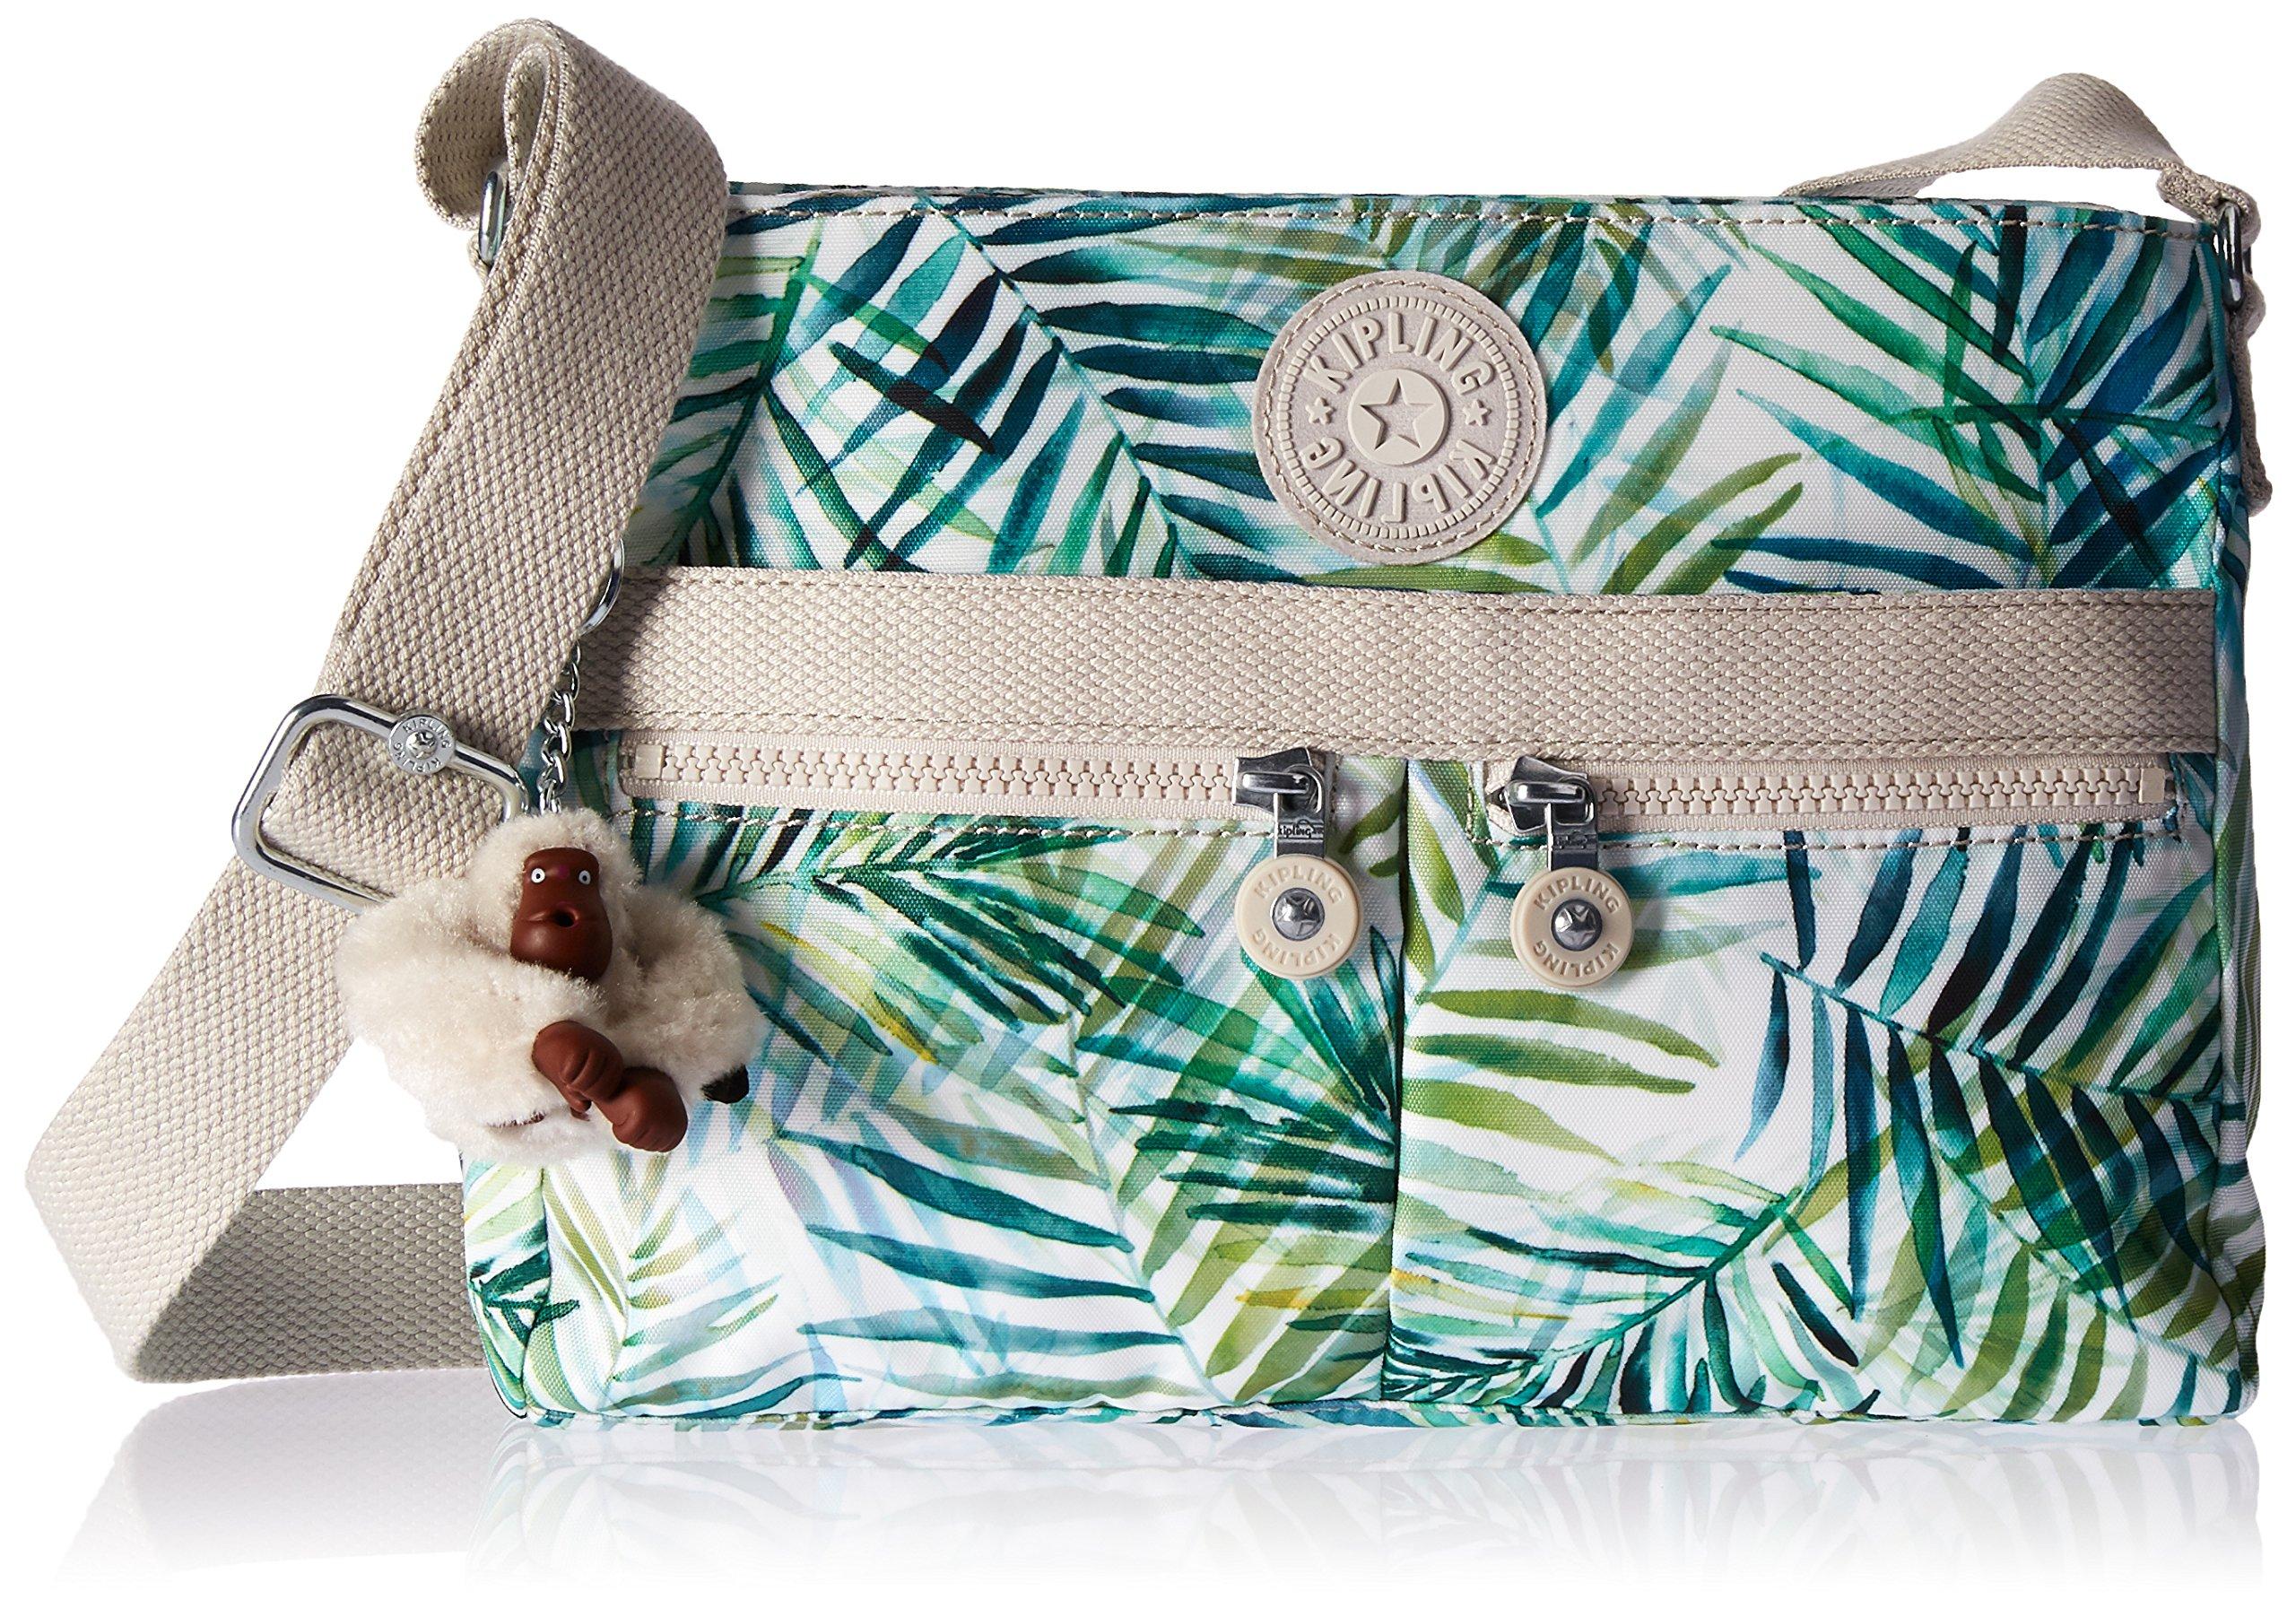 Kipling Women's Angie Lively Meadows Crossbody Bag